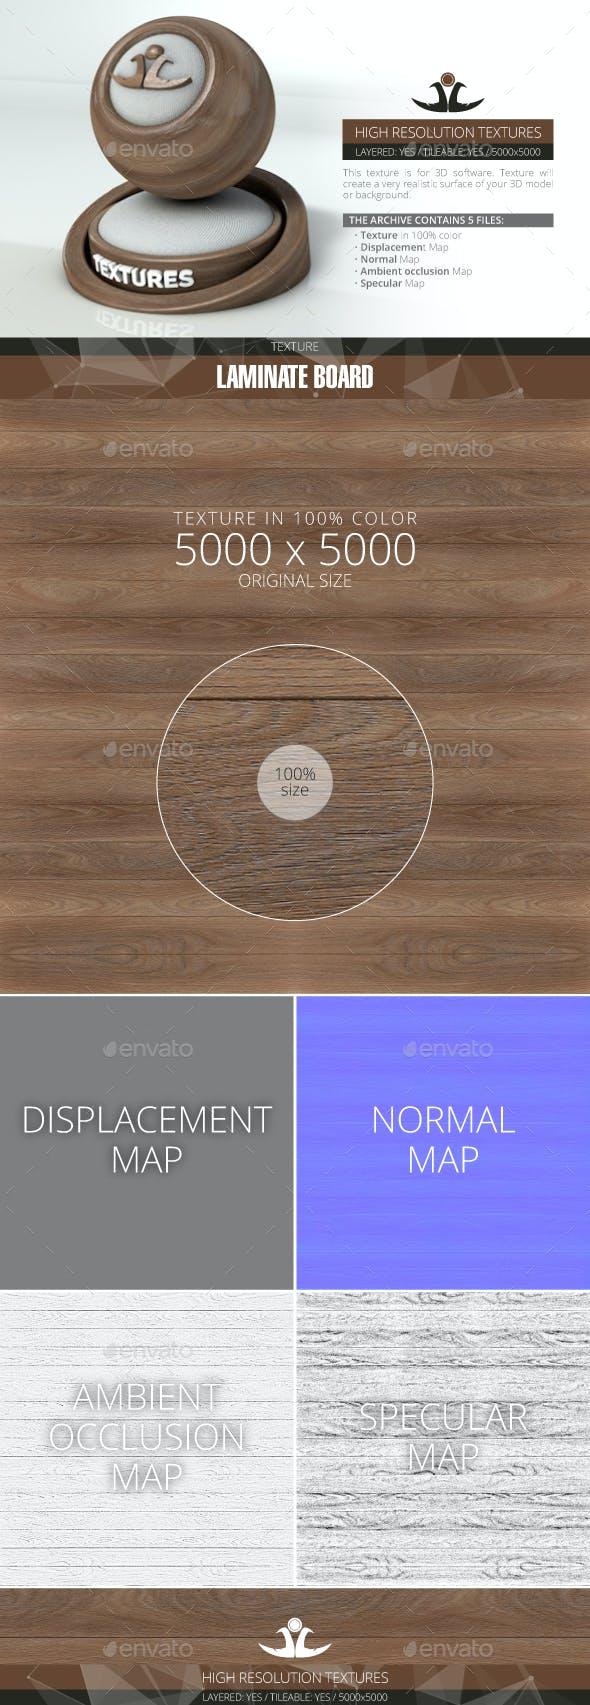 Laminate Board 3 - 3DOcean Item for Sale